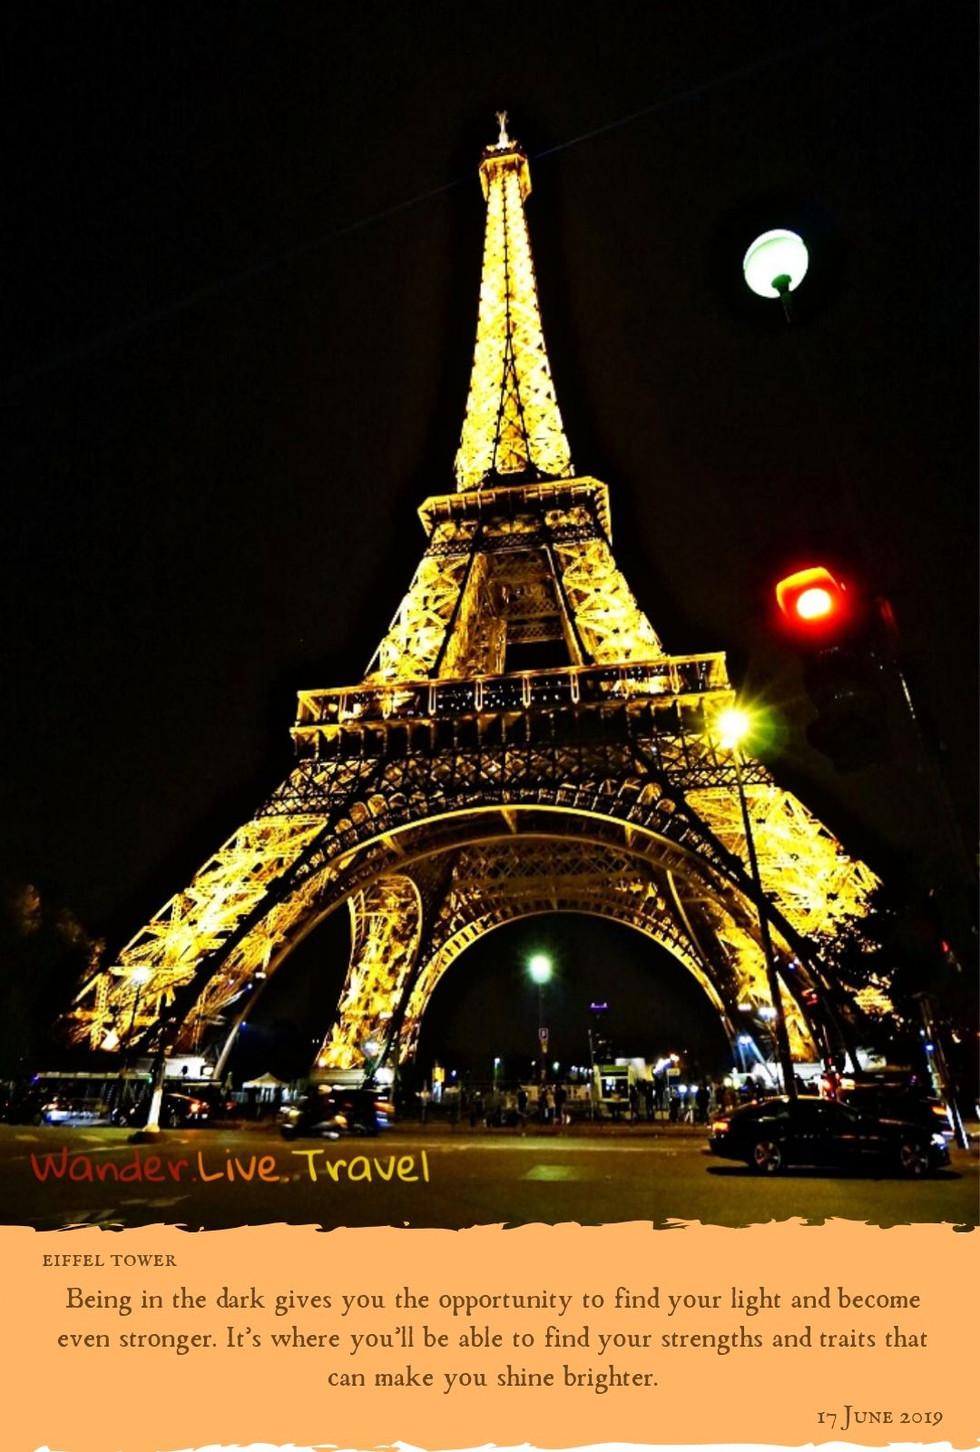 Famous Landmark - Eiffel Tower